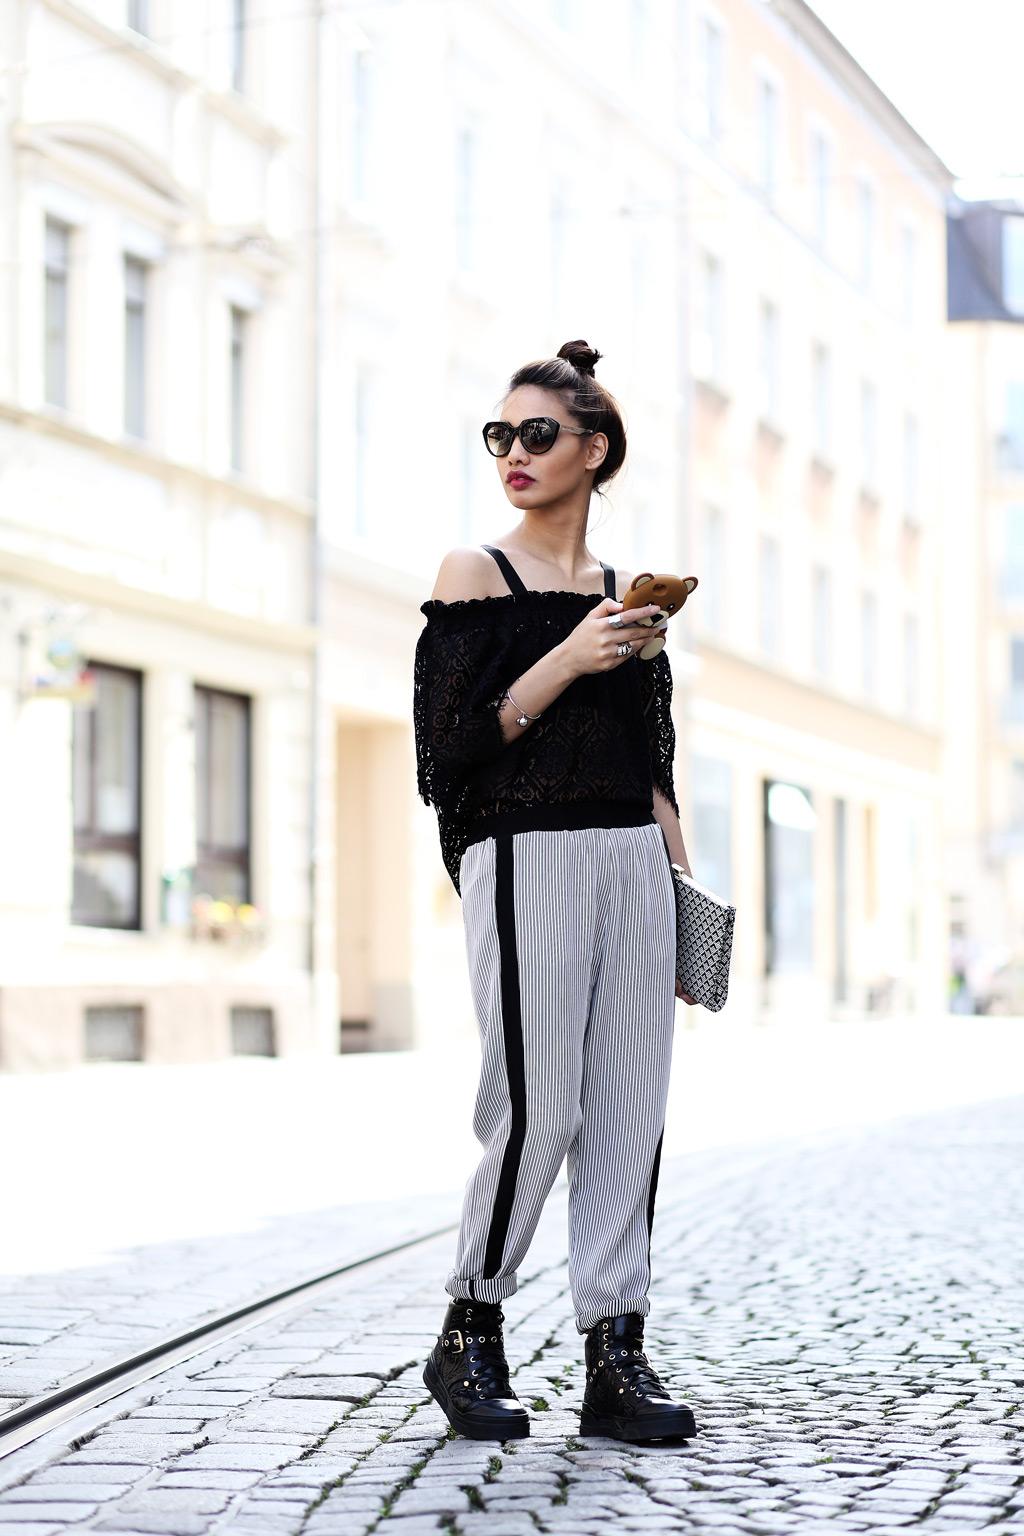 thefashionanarchy_anniep._outfit_style_look_spitze_lace_munichblogger_blogger_fashionblogger_munich_muenchen_fashionblogger_ash_sneaker_5